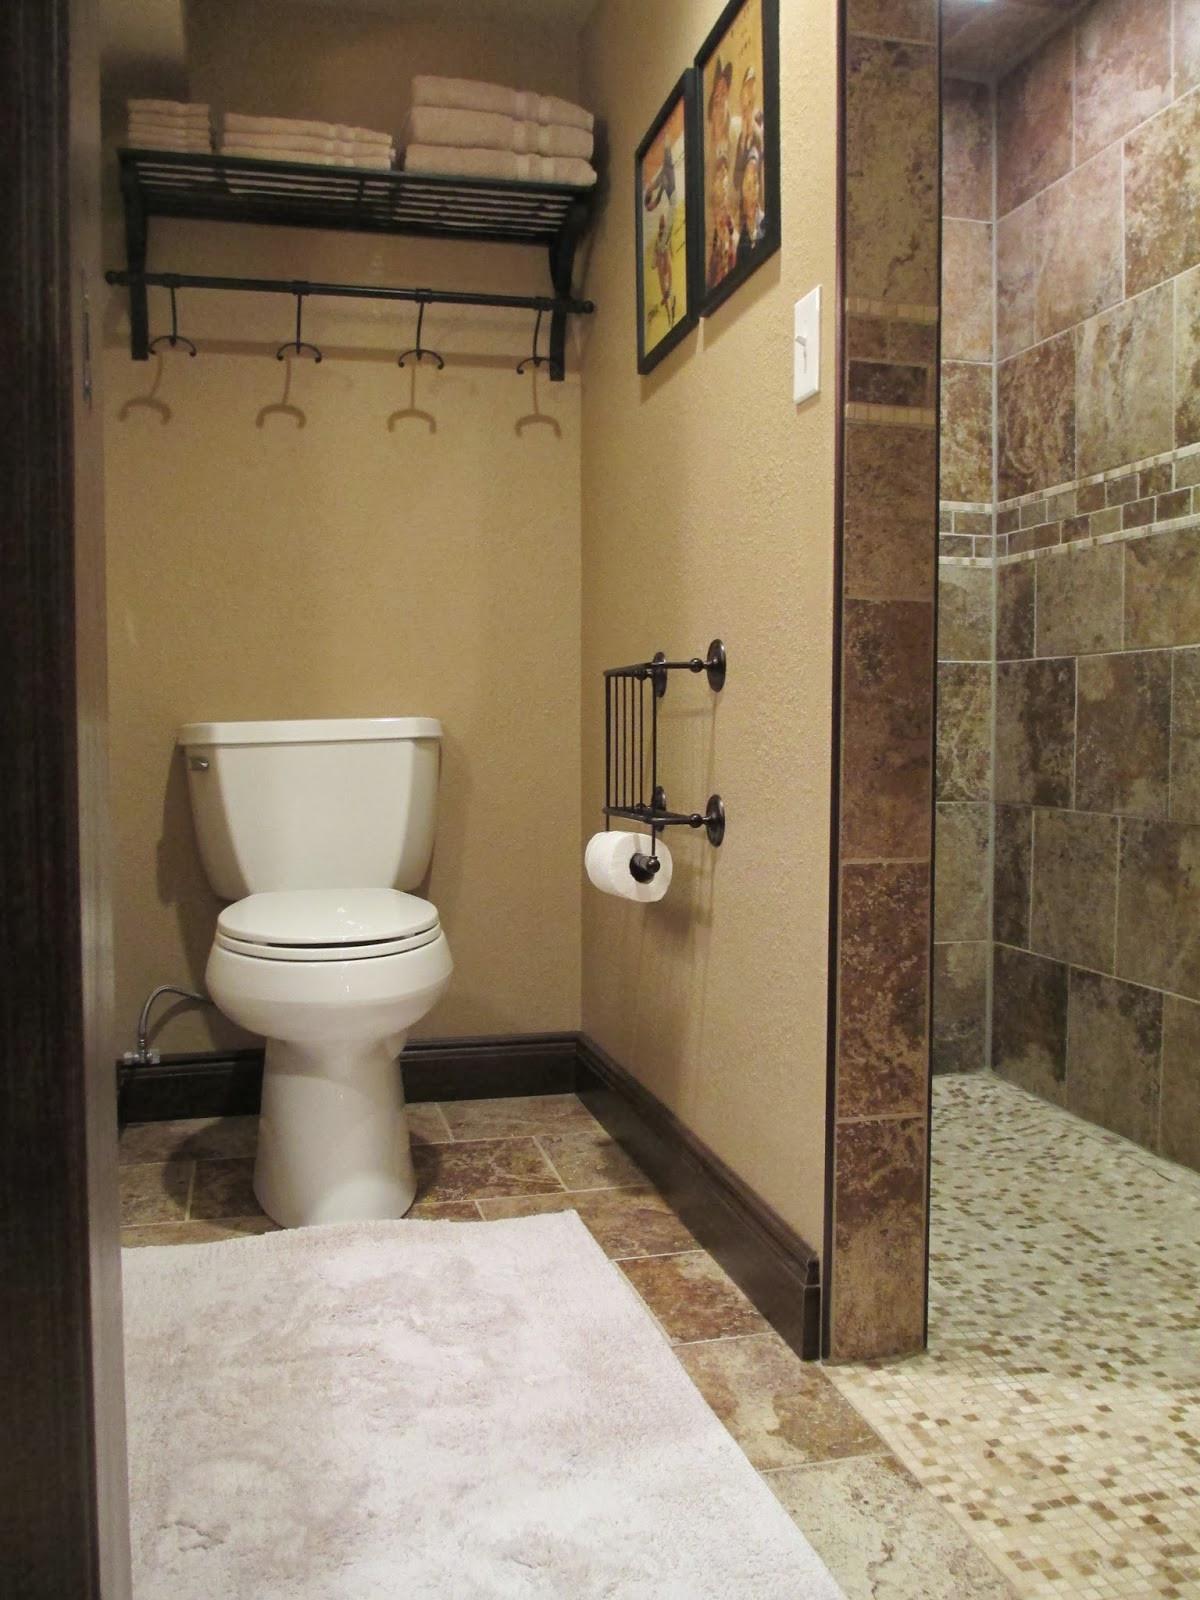 Basement Bathroom Design  KRUSE S WORKSHOP House Tour Basement Family Room Bath